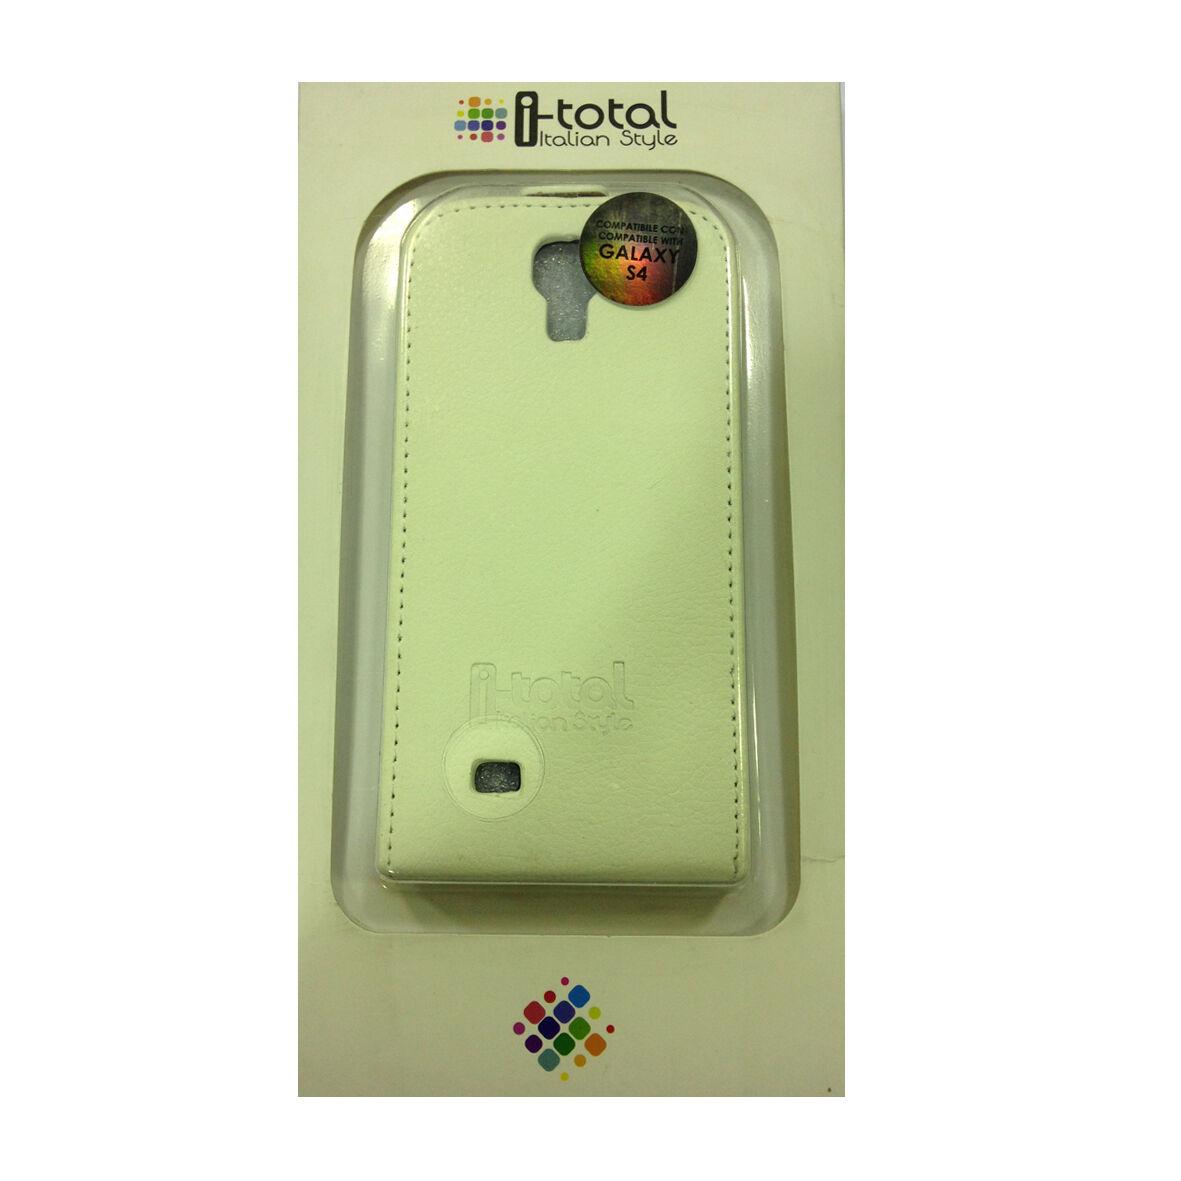 COVER mascherina iphone SAMSUNG GALAXY S4 bianca a portafoglio eco-pelle